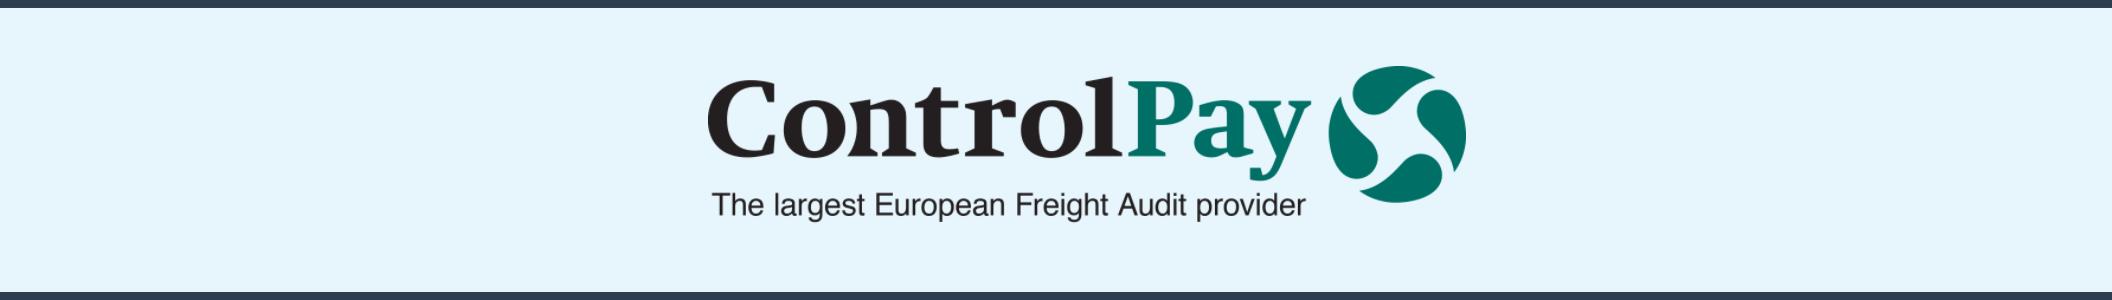 freight audit. ControlPay